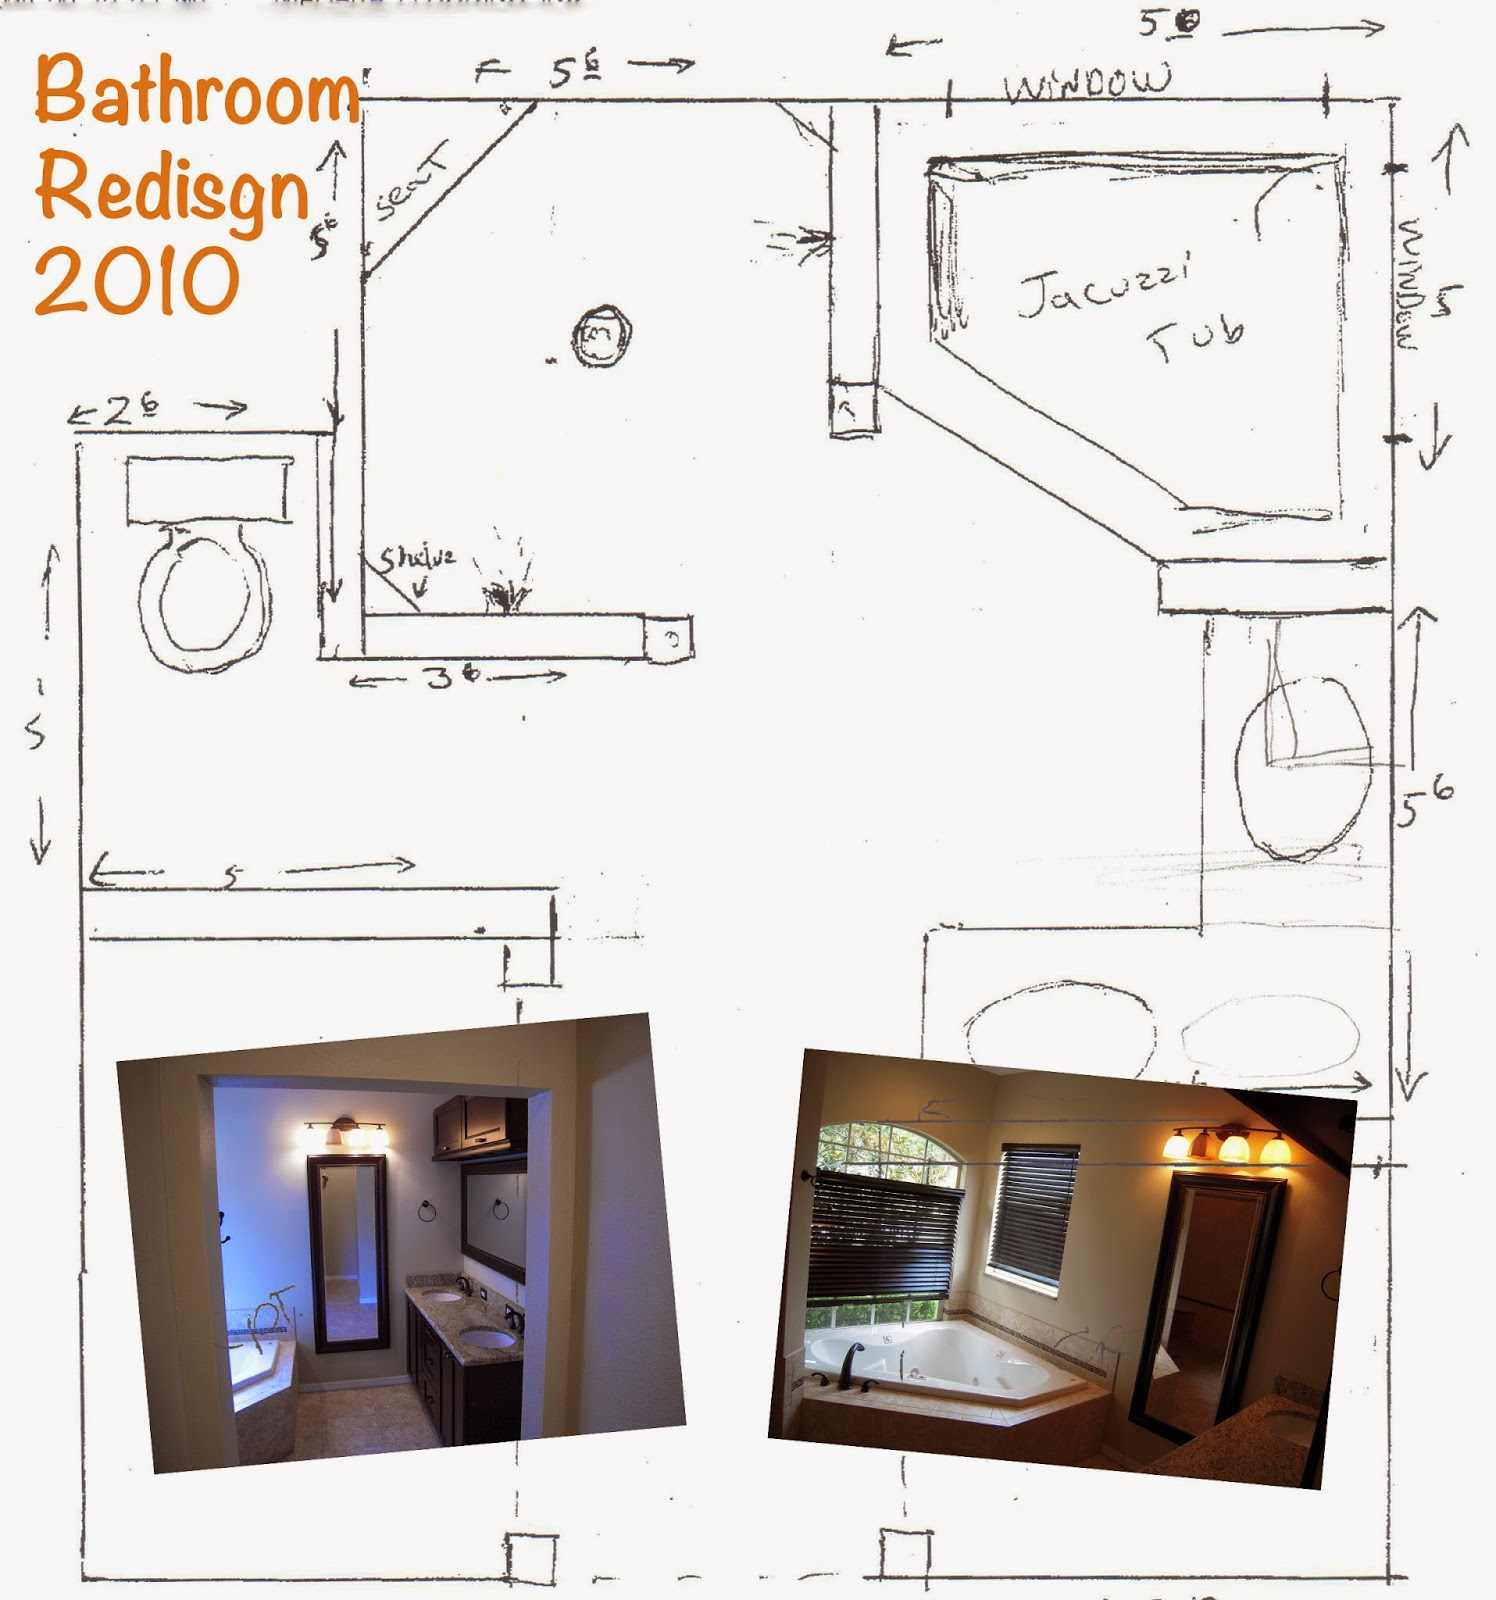 Tampa Bay Bathroom Remodeling: 1120110659